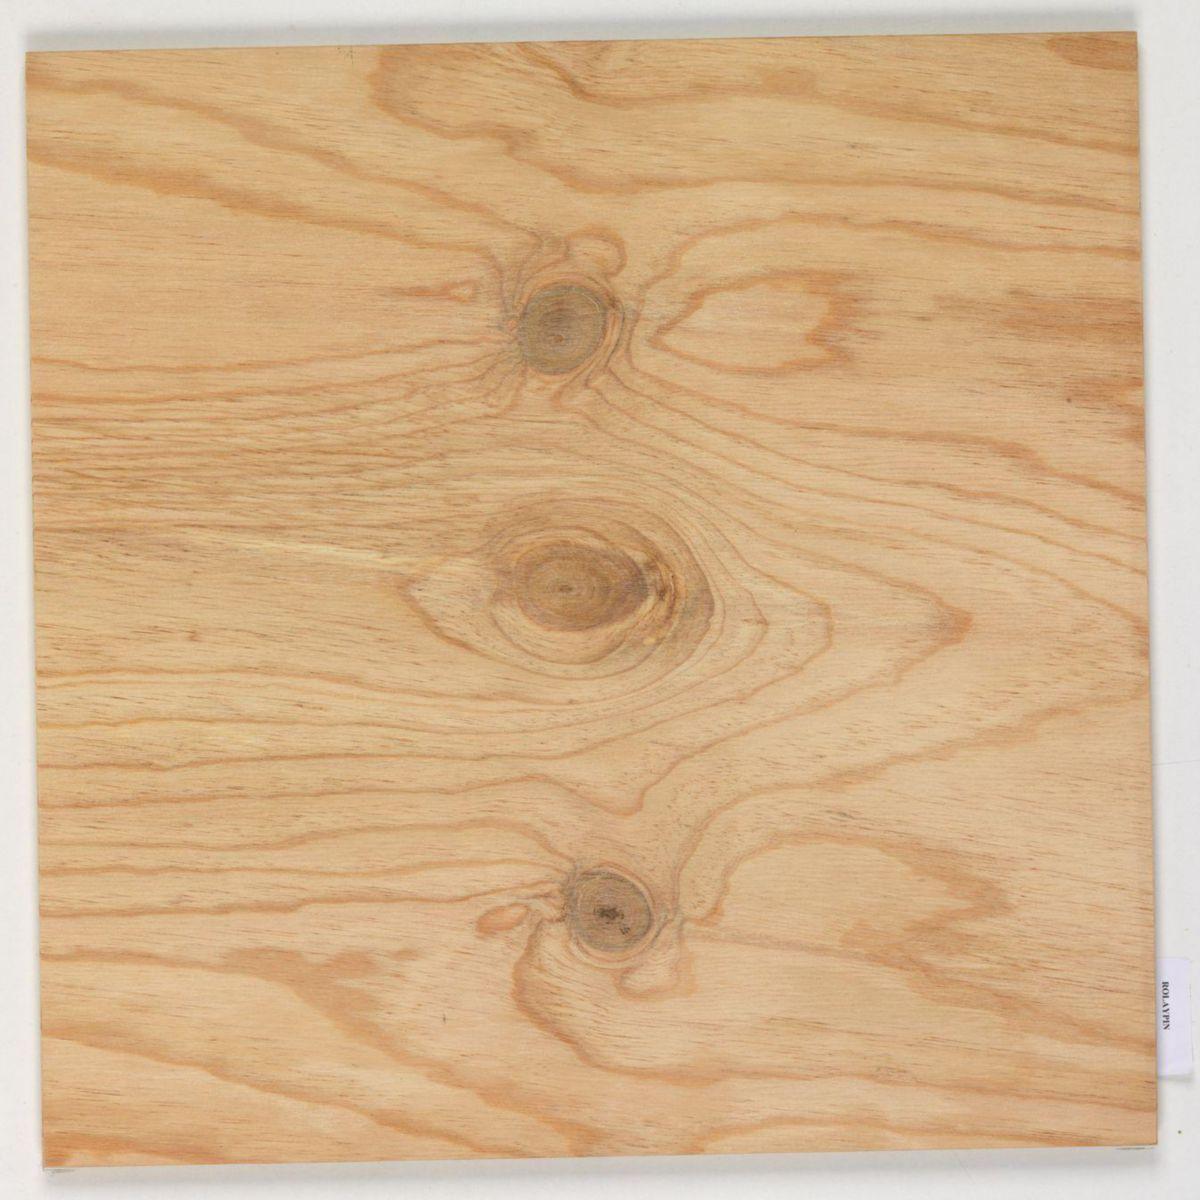 tablette pin castorama meuble etagere bois etagare pin tablettes l x p x h meuble etagere bois. Black Bedroom Furniture Sets. Home Design Ideas